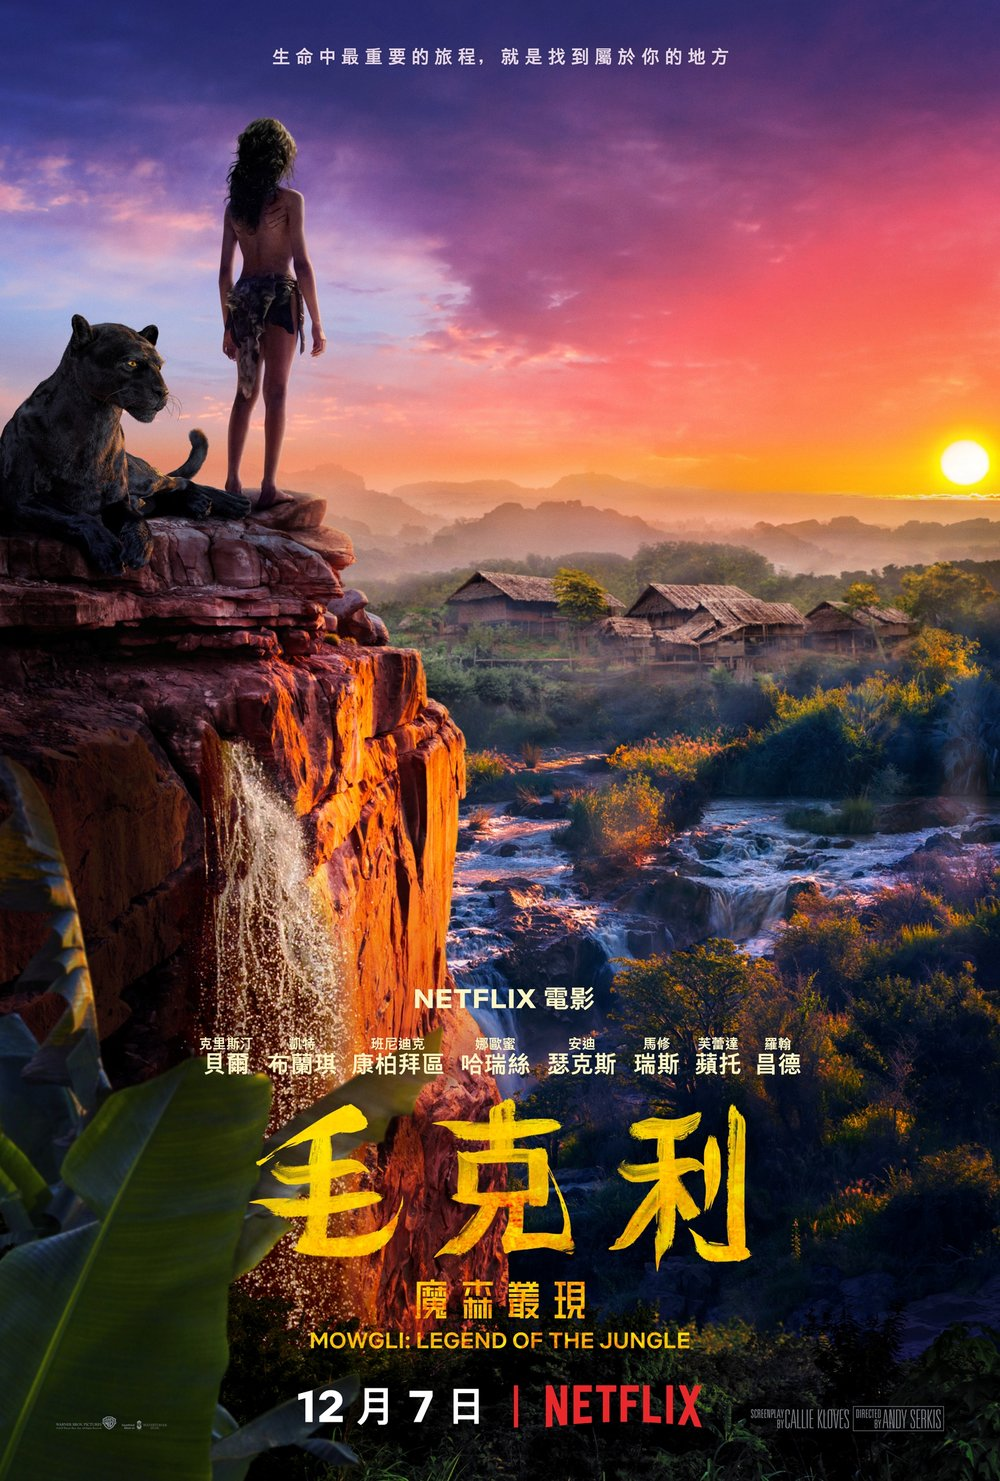 20181108_MowgliLegendoftheJungle_Poster.jpg